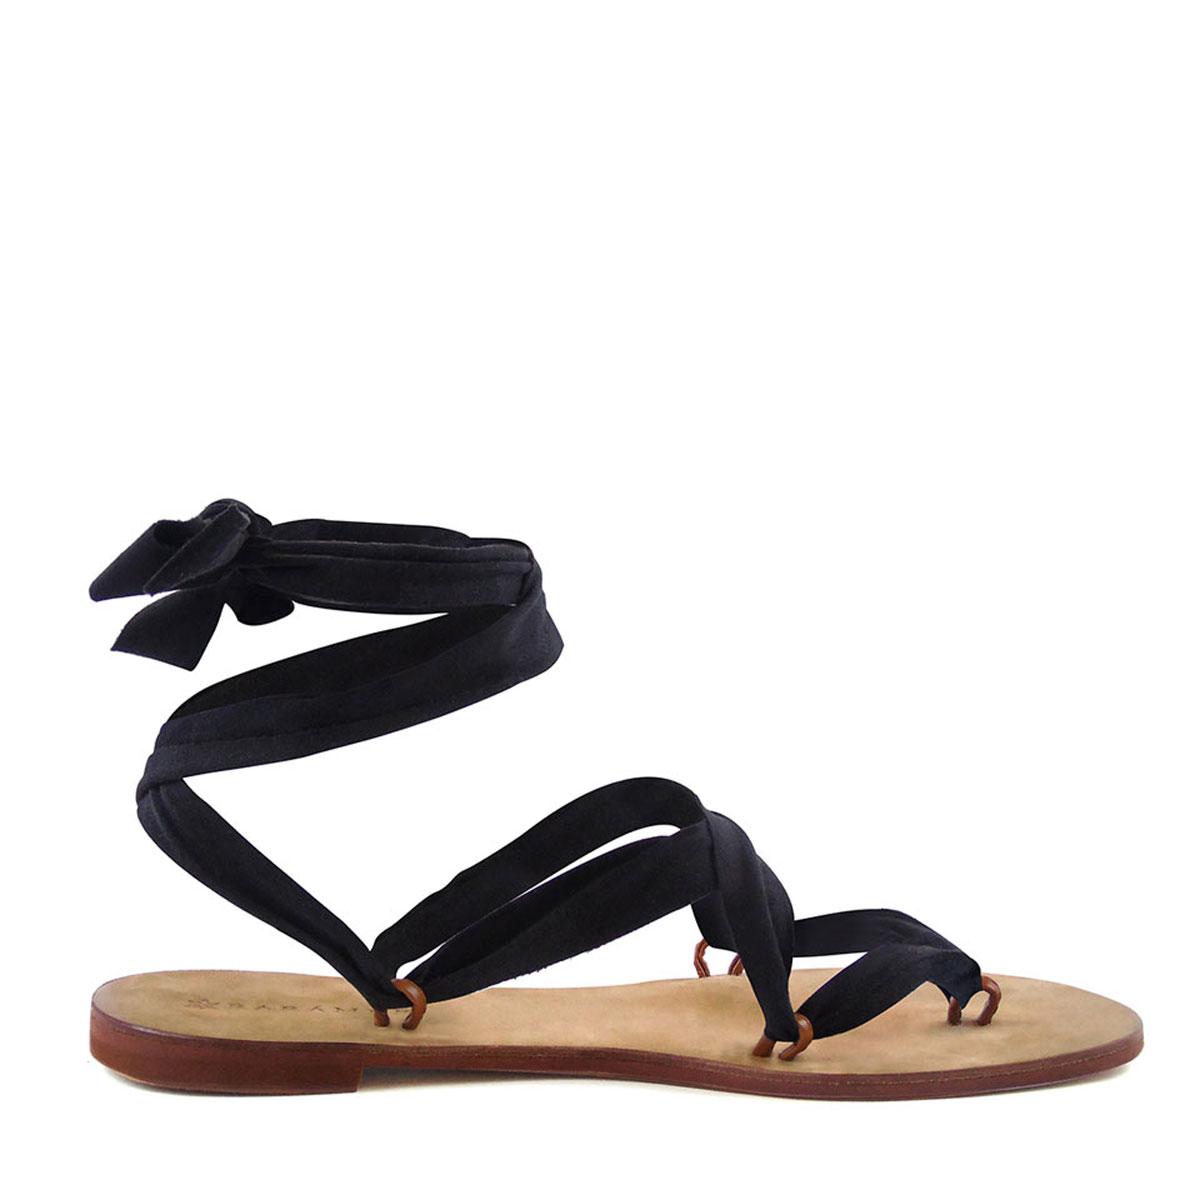 Black ribbon sandals - Raramuri Sandals Black Ribbon Suede